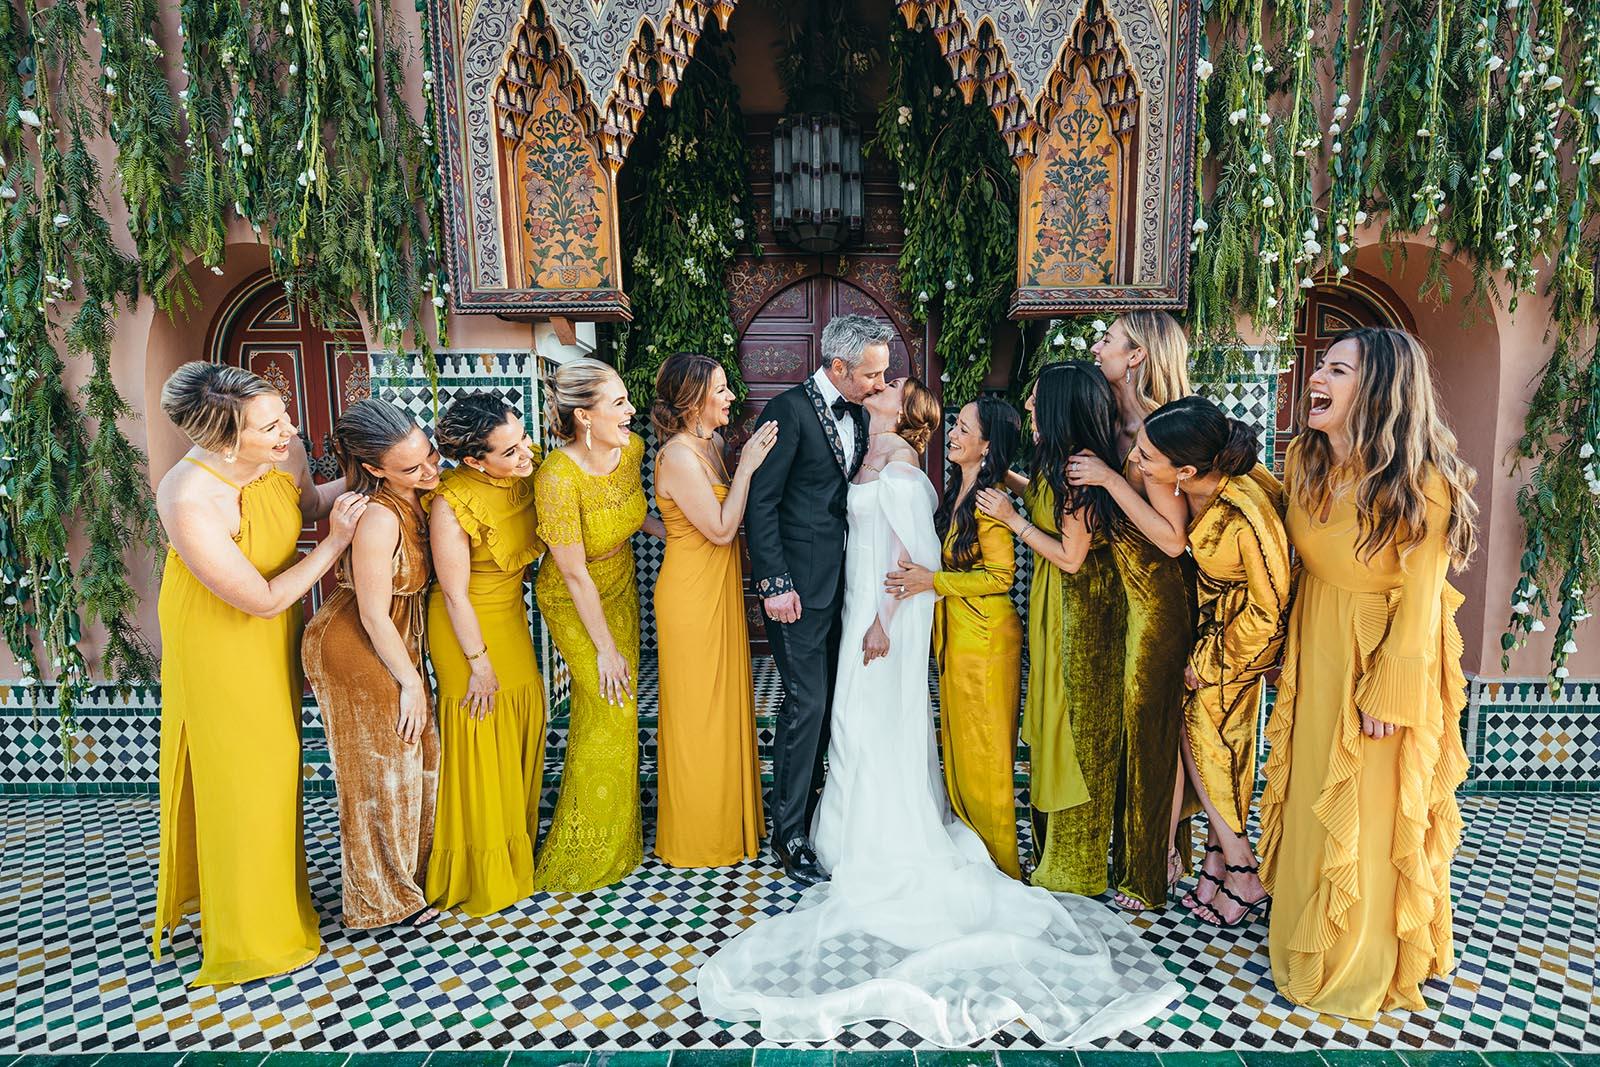 luxury wedding in marrakech la pause desert of agafay la mamounia and la maison arabe